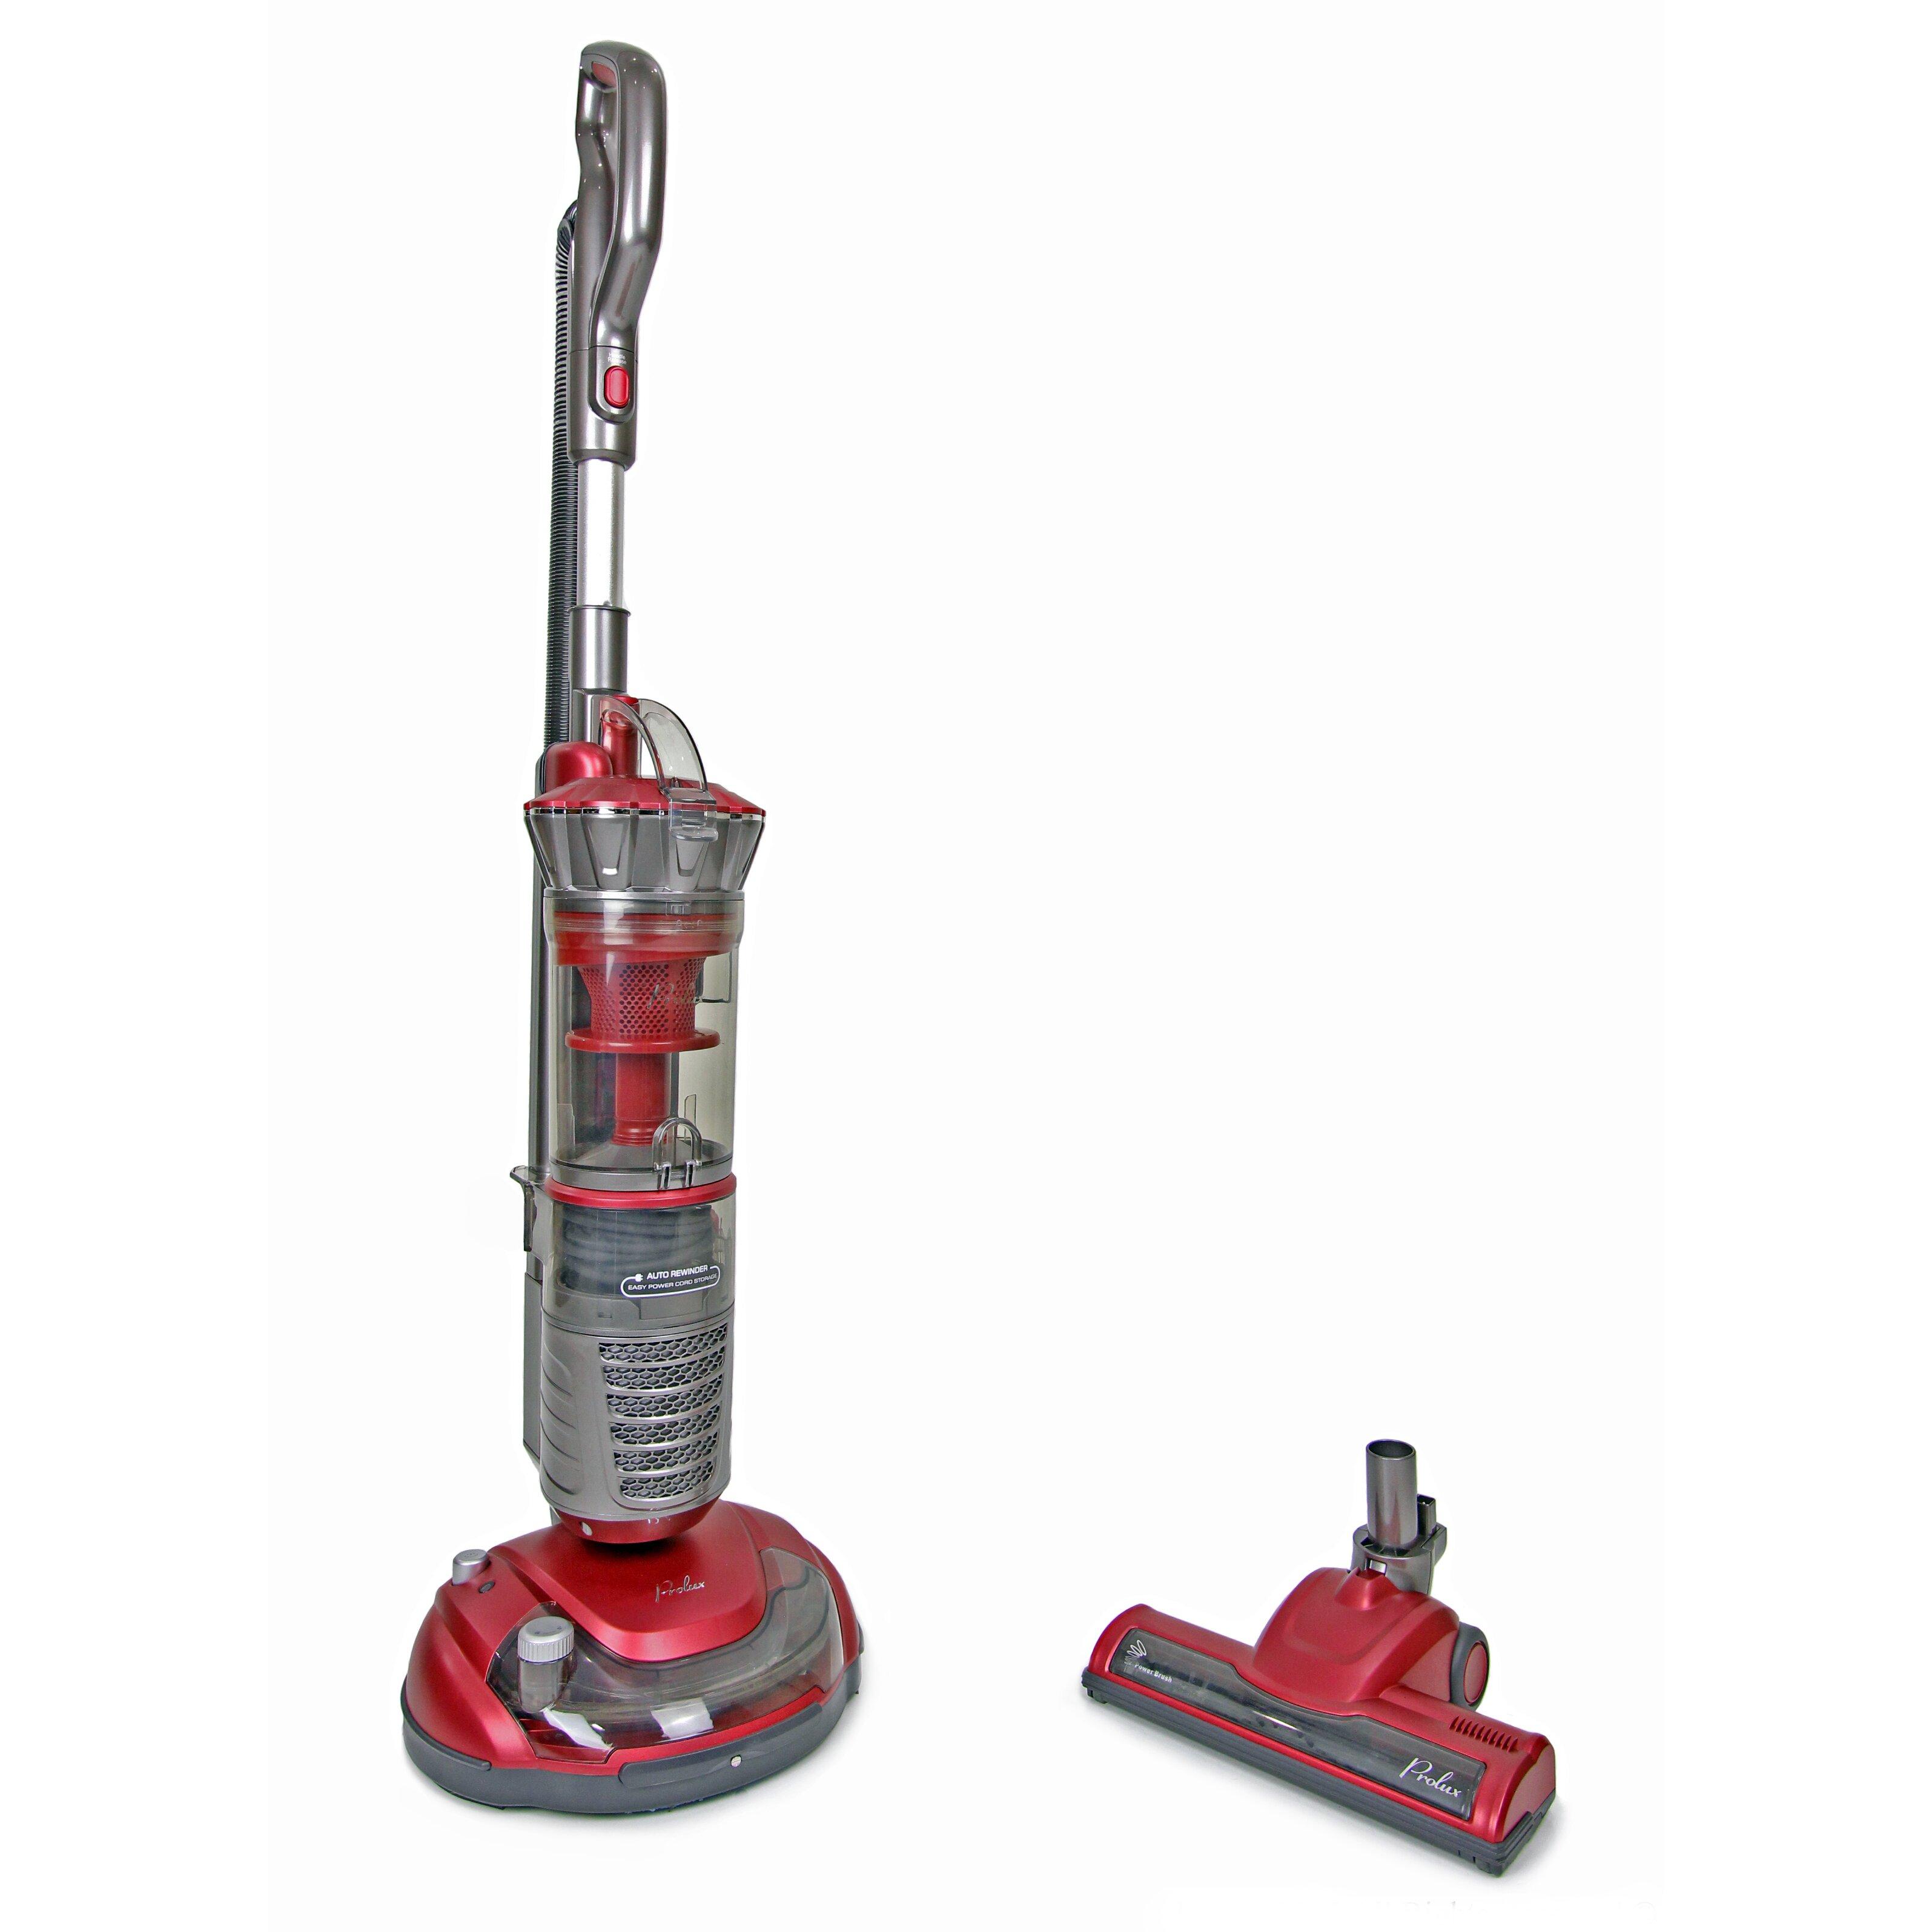 Prolux allvac floor cleaner wayfair for Wood floor vacuum cleaner